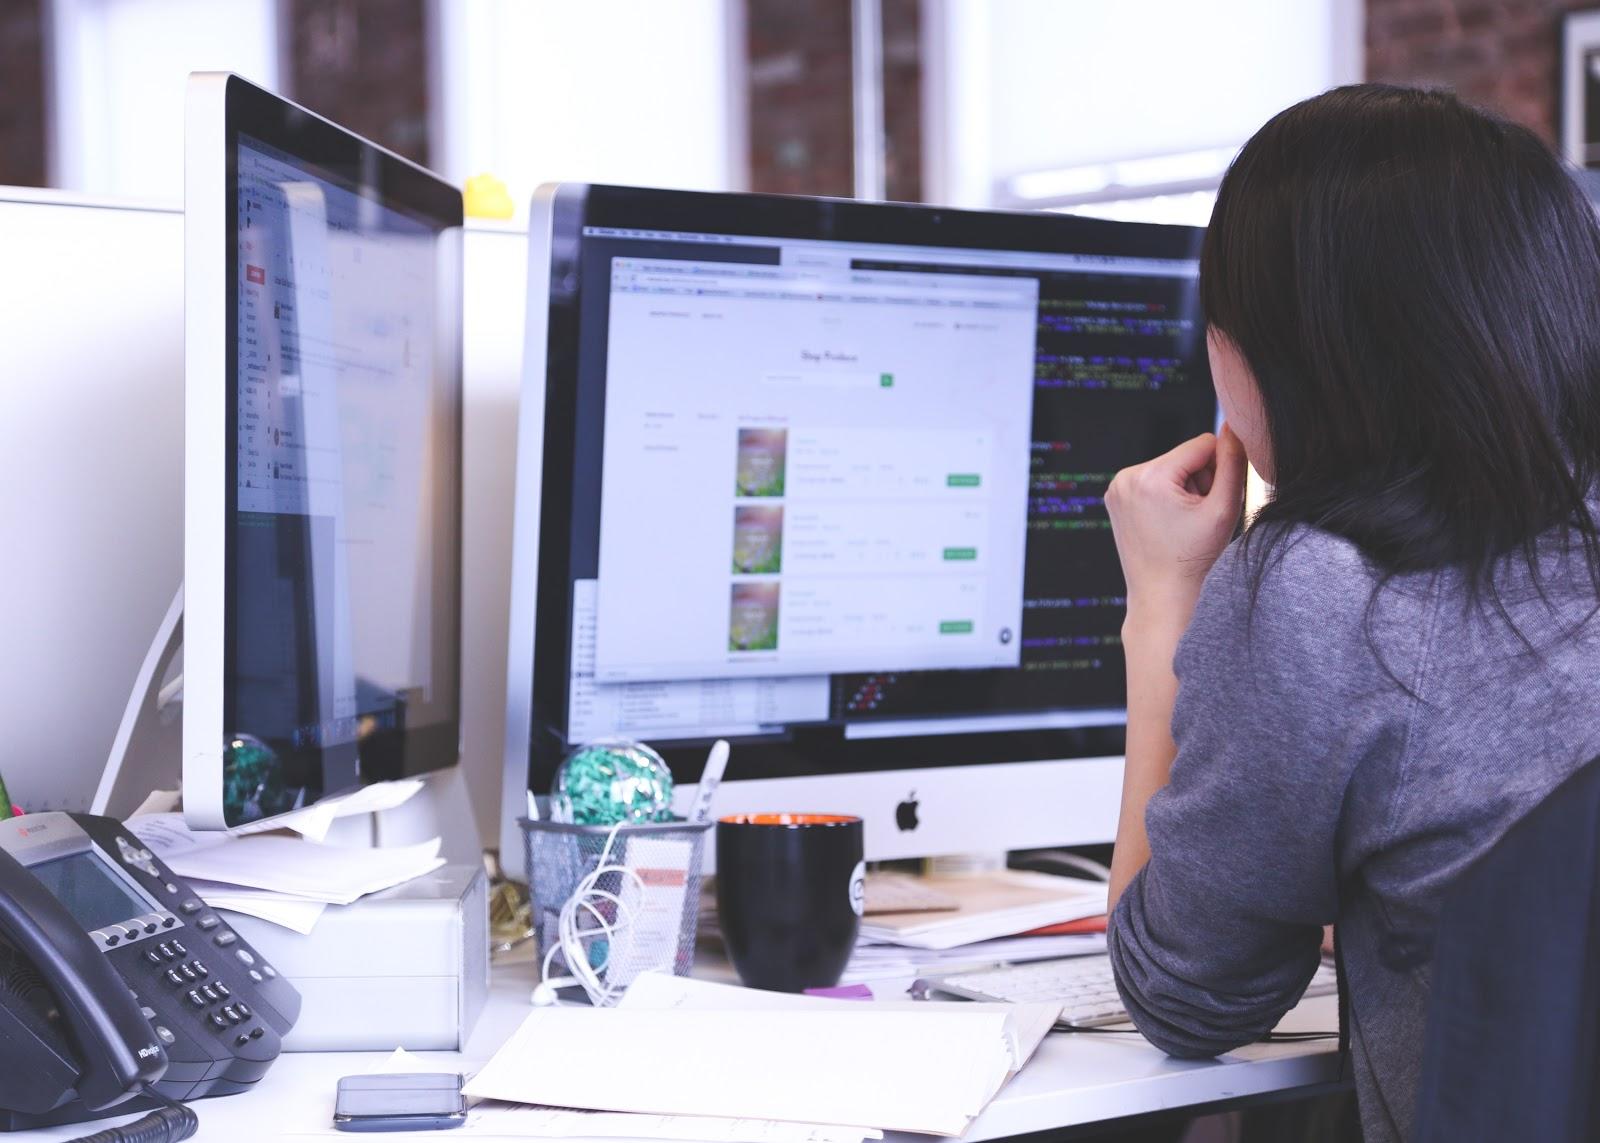 Co-Opvs. Internship: Woman looking at dual computer screens